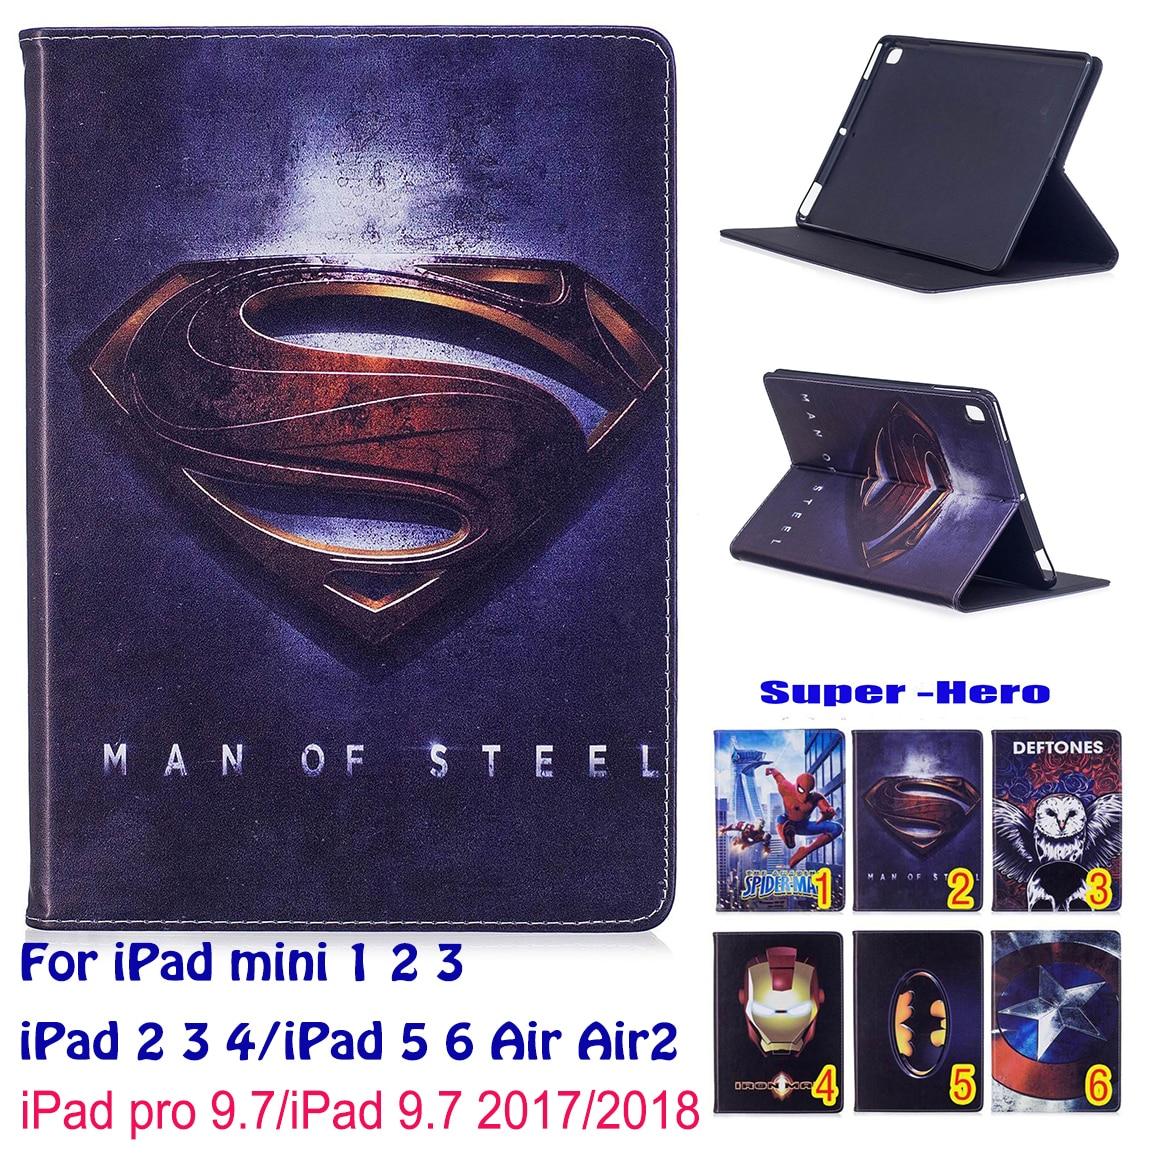 Spiderman Superman Pattern Case For Apple iPad mini 1 2 3 iPad 5 6 Air Air2 iPad 9.7 2017 2018 iPad 4 Case Tablet Stand Funda цена